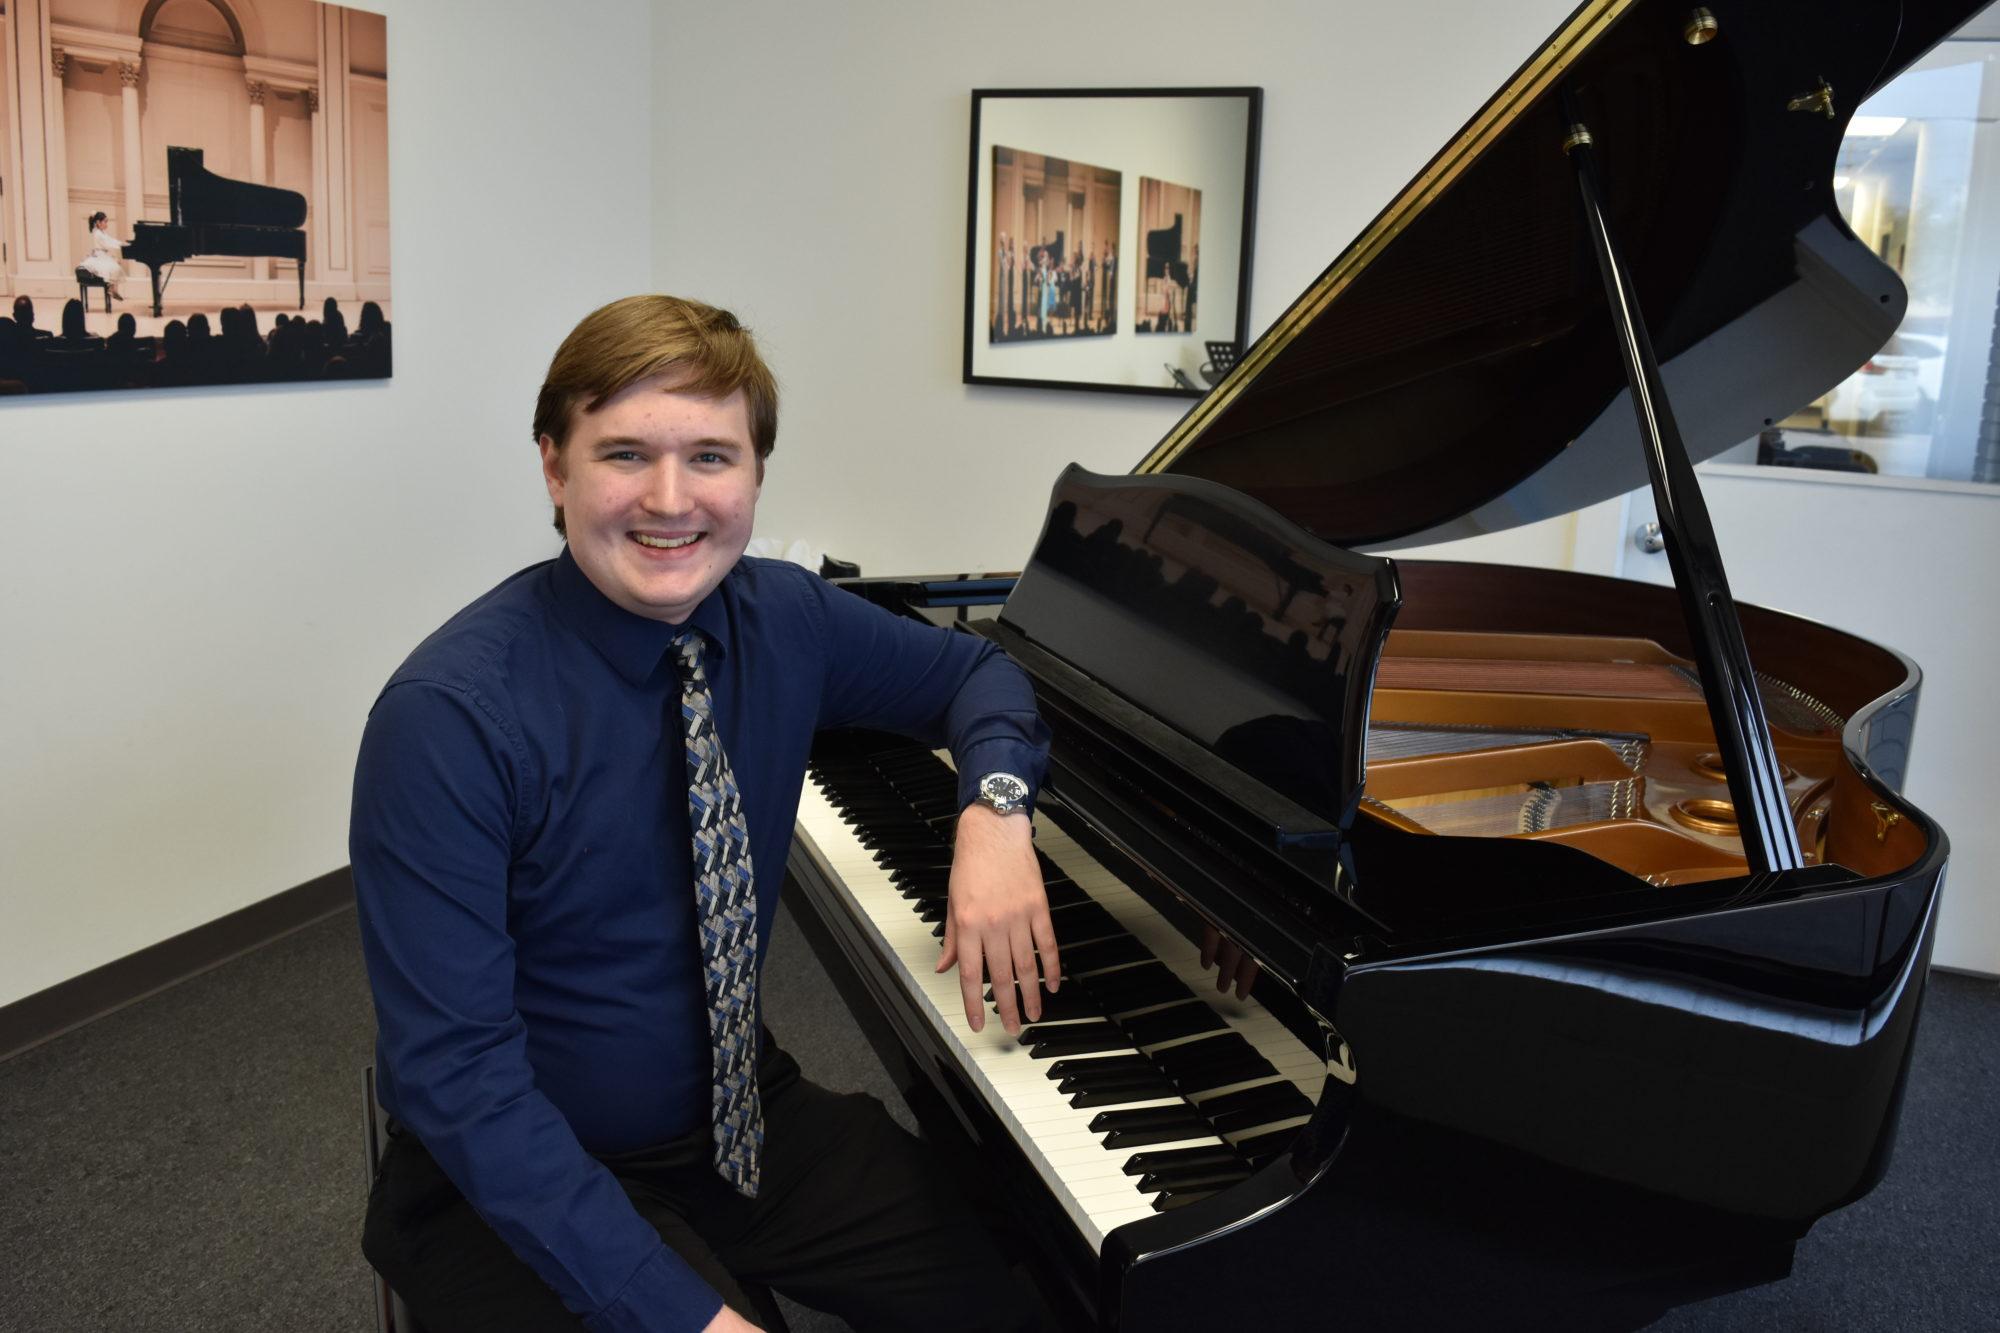 Erik Sandstrom – Piano and voice